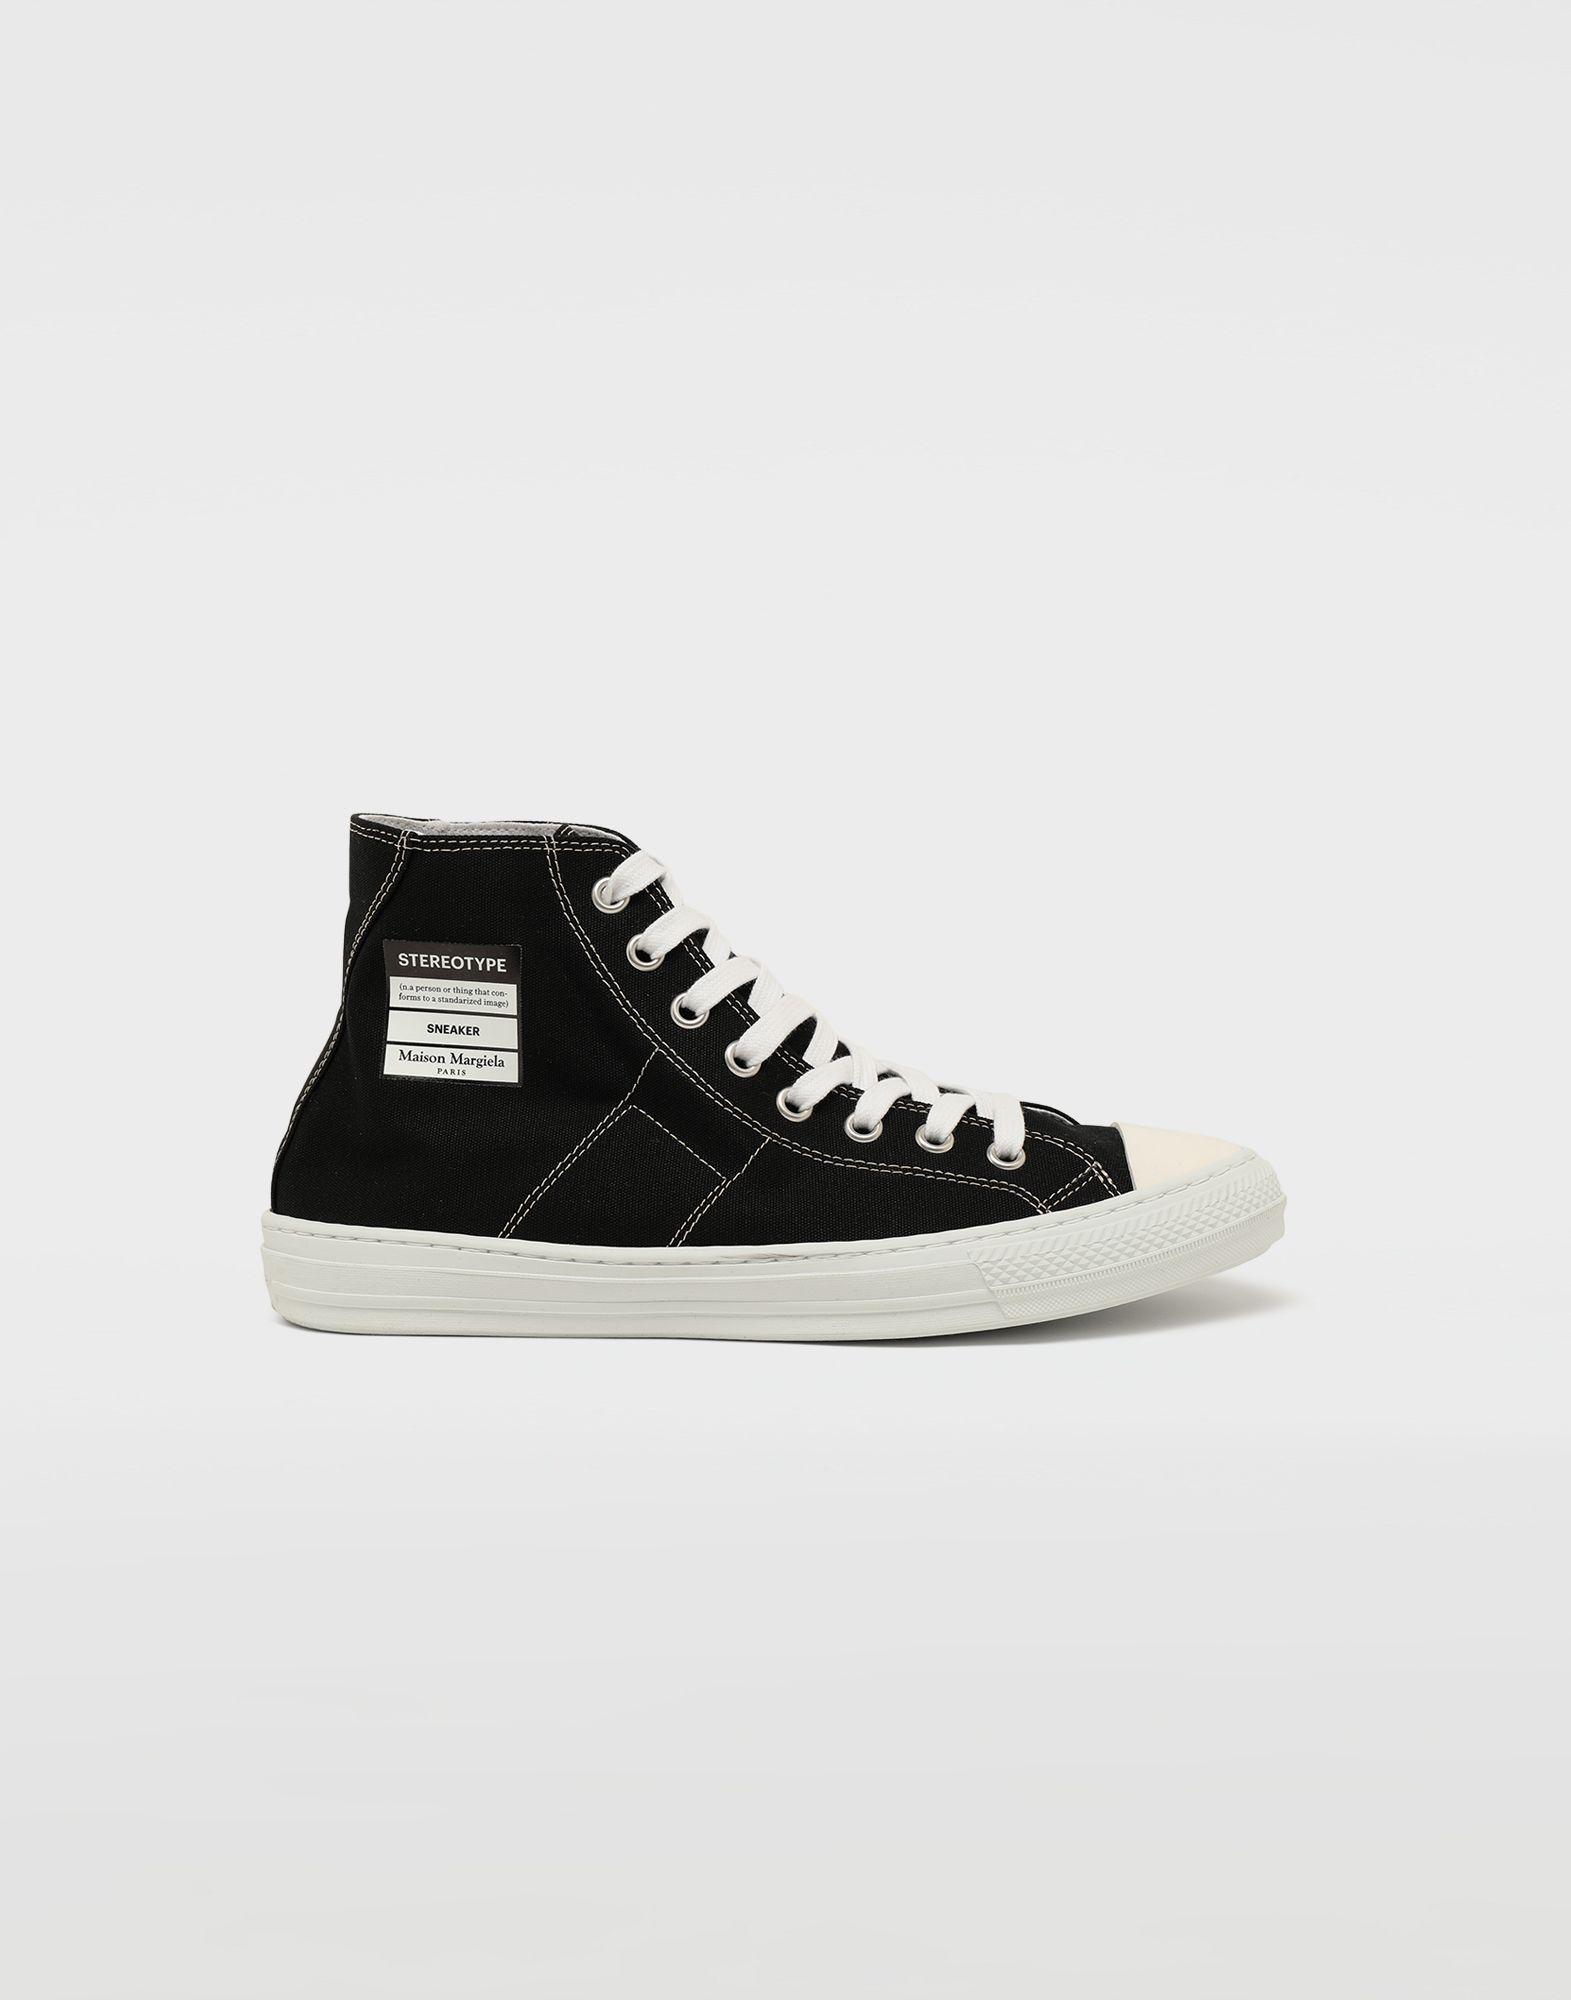 MAISON MARGIELA High-Top-Sneakers Stereotype Sneakers Herren f